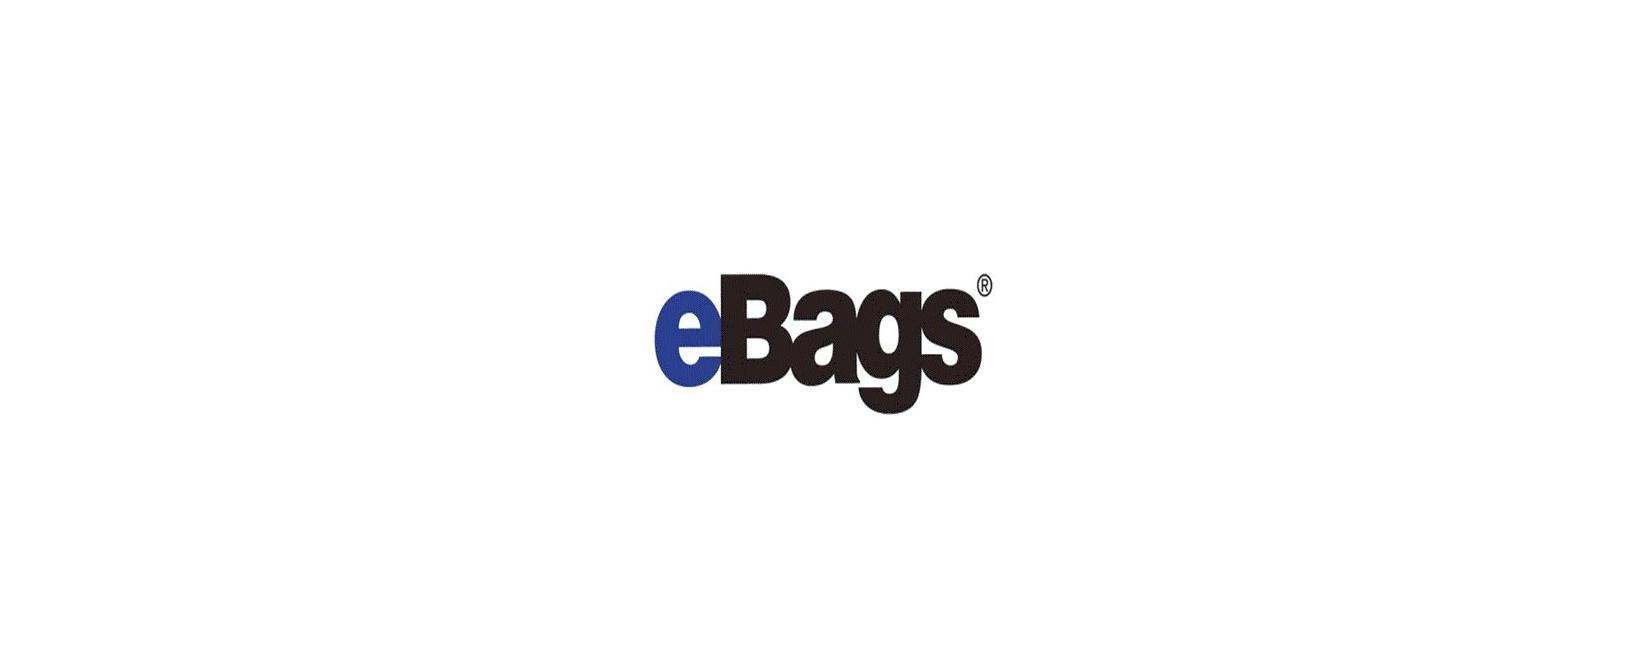 EBags Coupon Code 2021